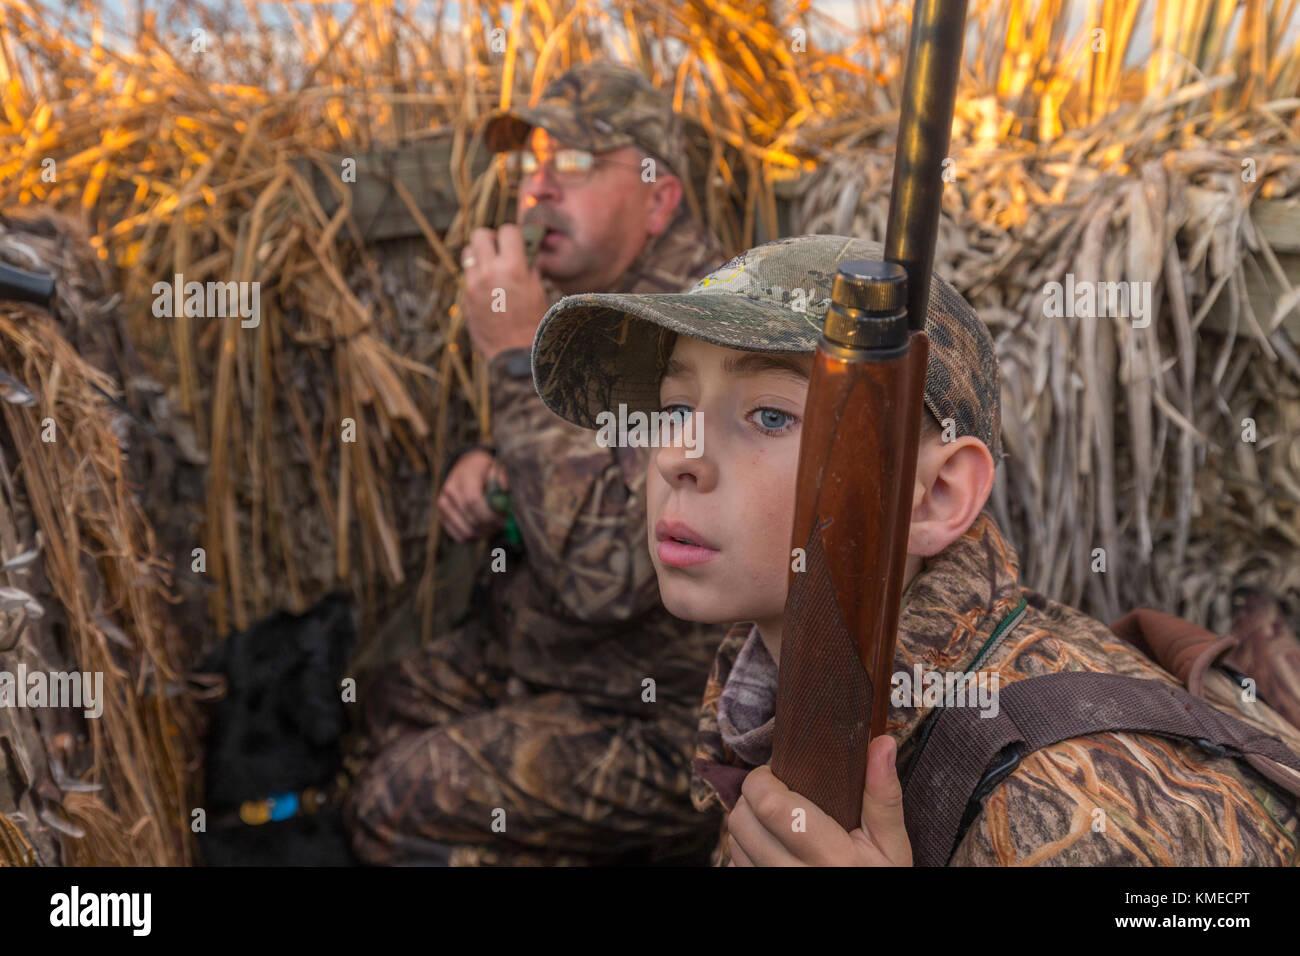 father and son duck hunting, Suisun Marsh, Suisun City, California, USA - Stock Image